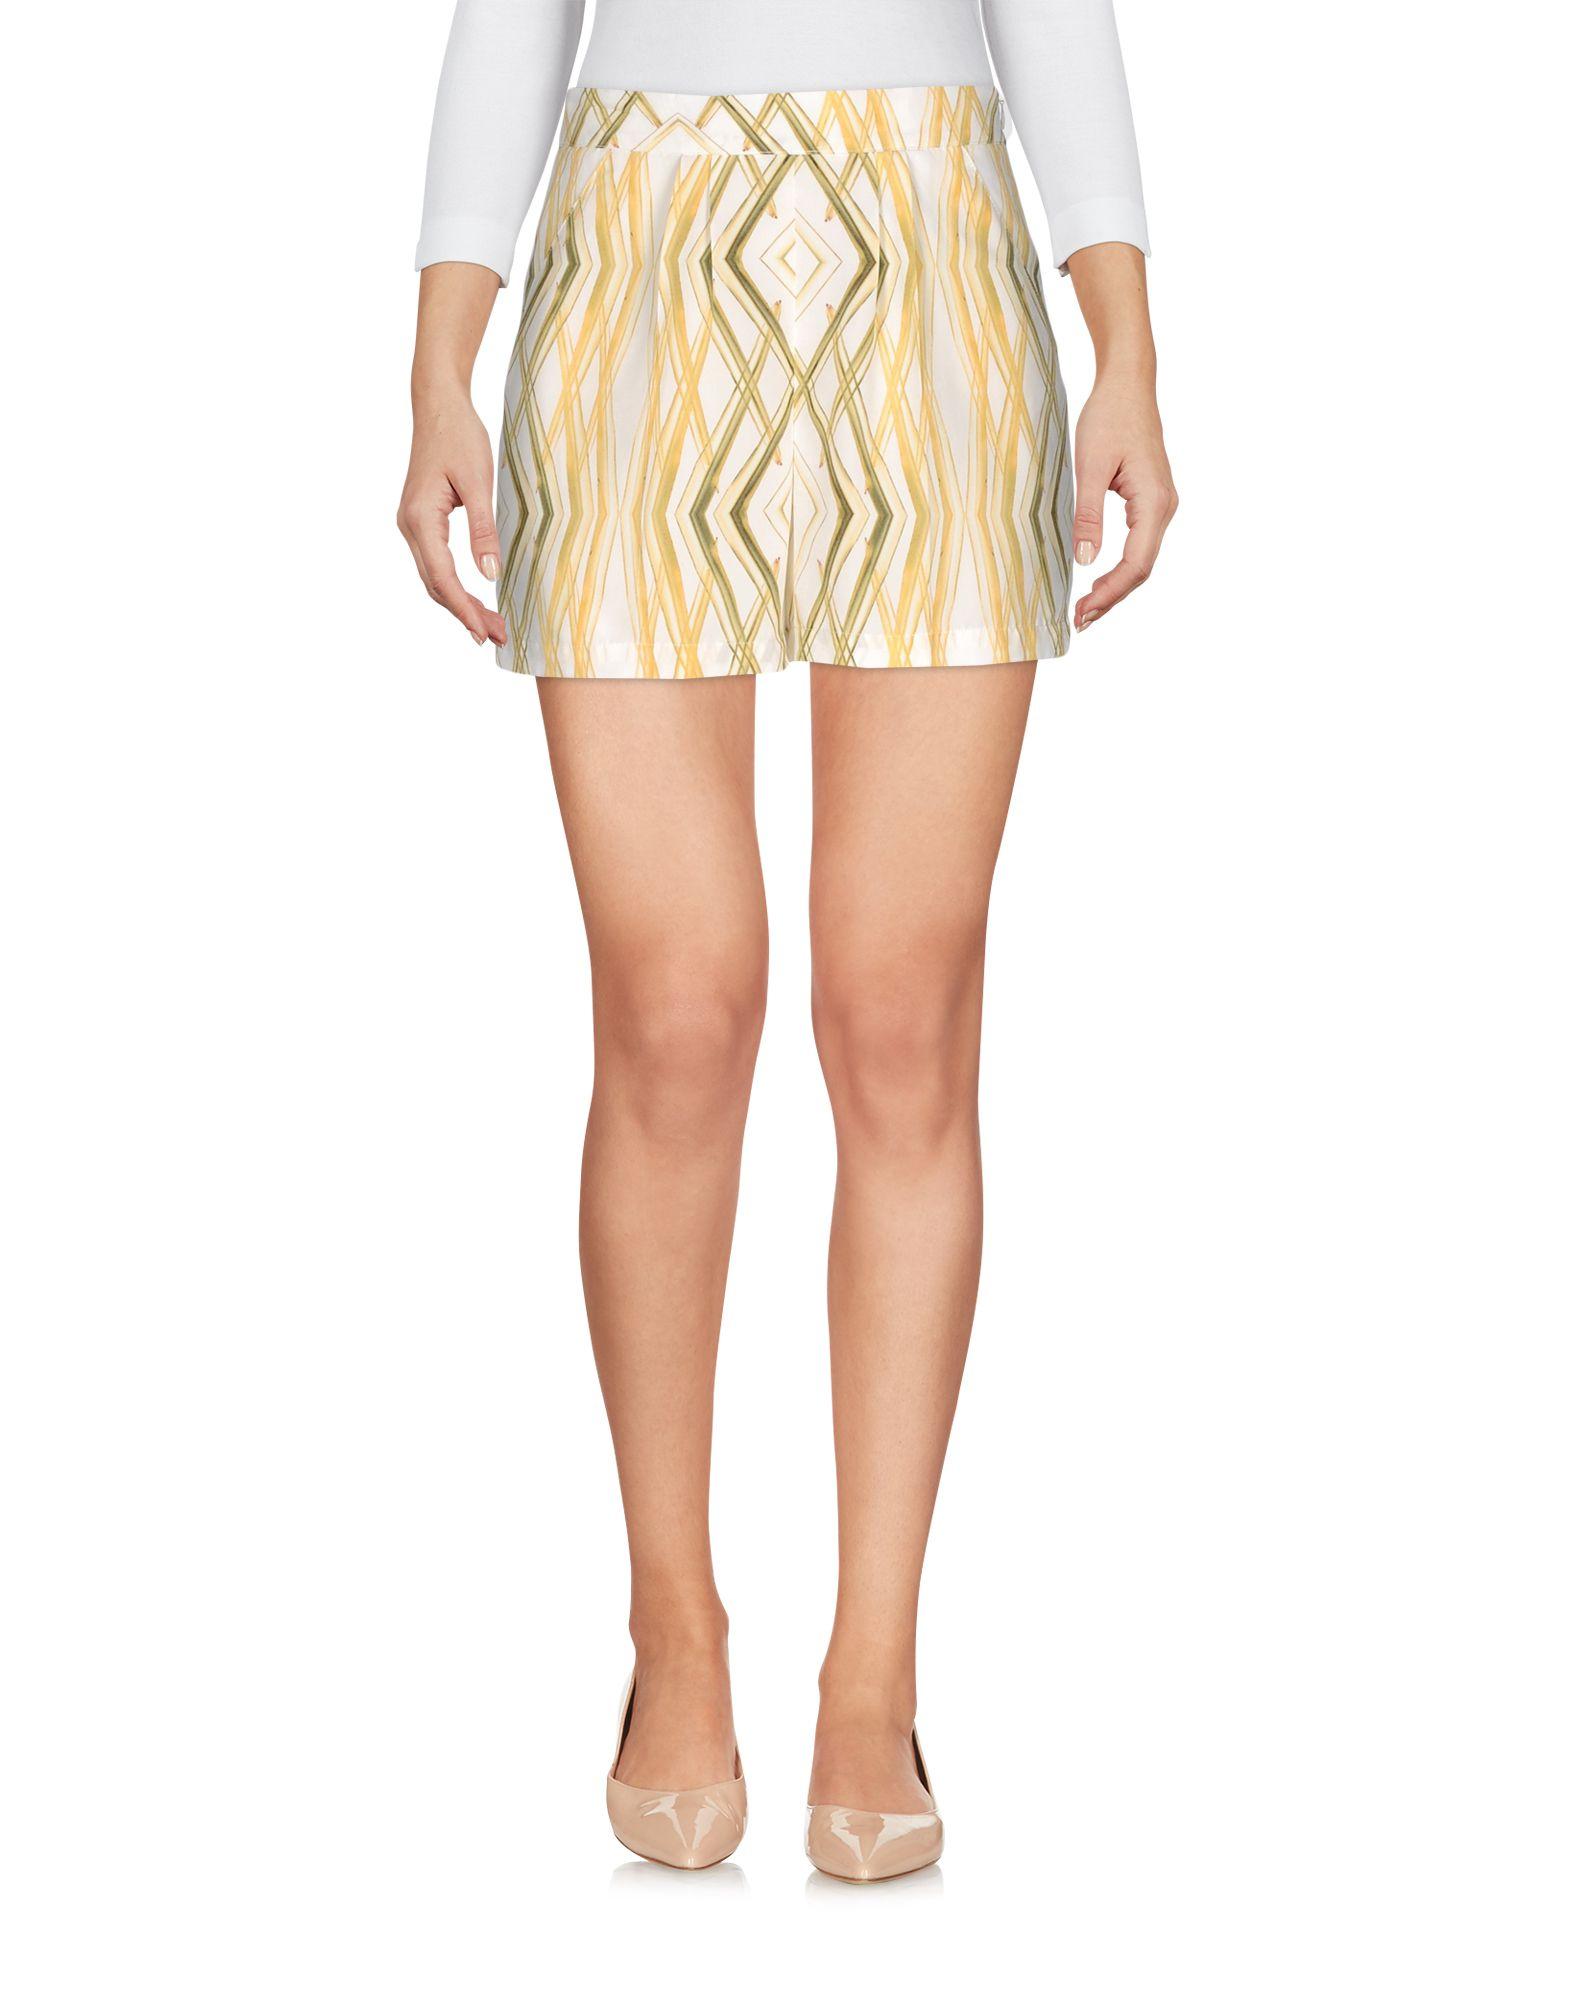 TOTHEM Shorts & Bermuda in Ivory